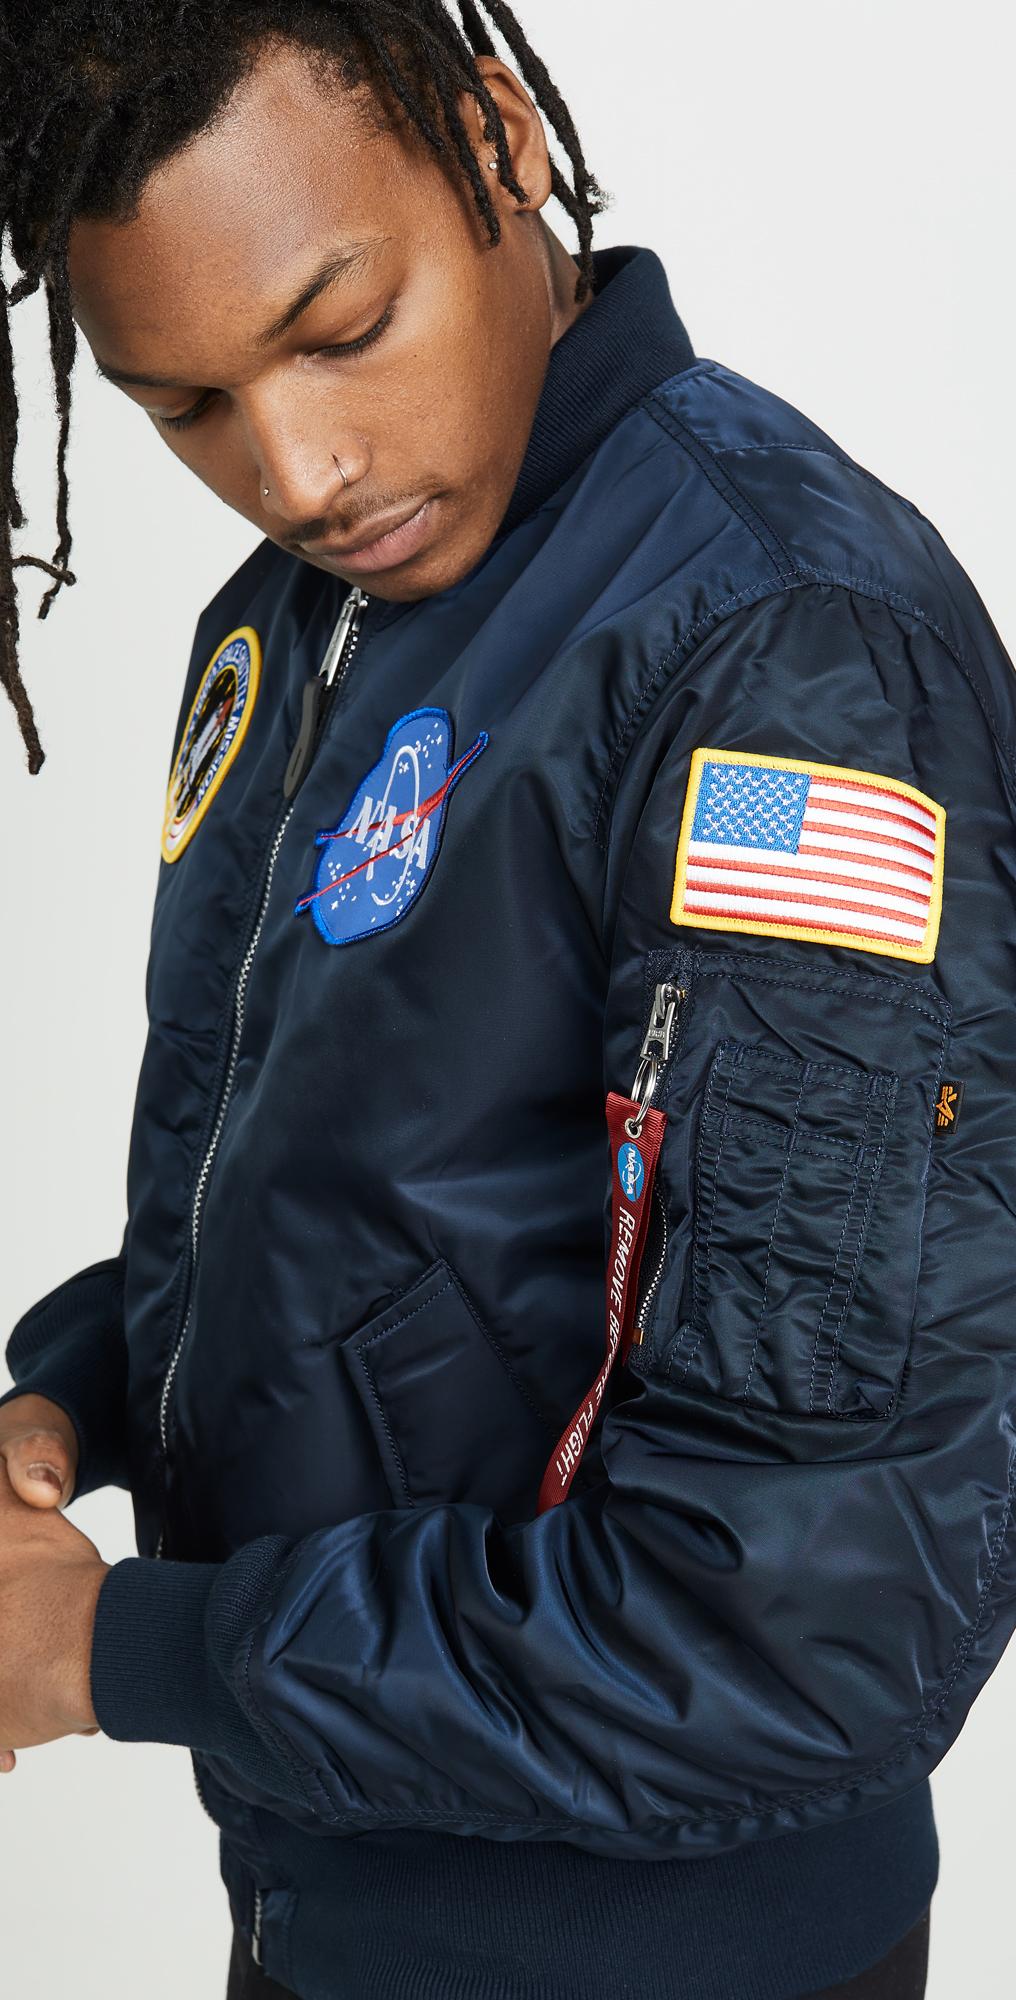 niska cena buty do biegania kupować Alpha Industries NASA MA-1 Flight Jacket | EASTDANE SAVE UP ...